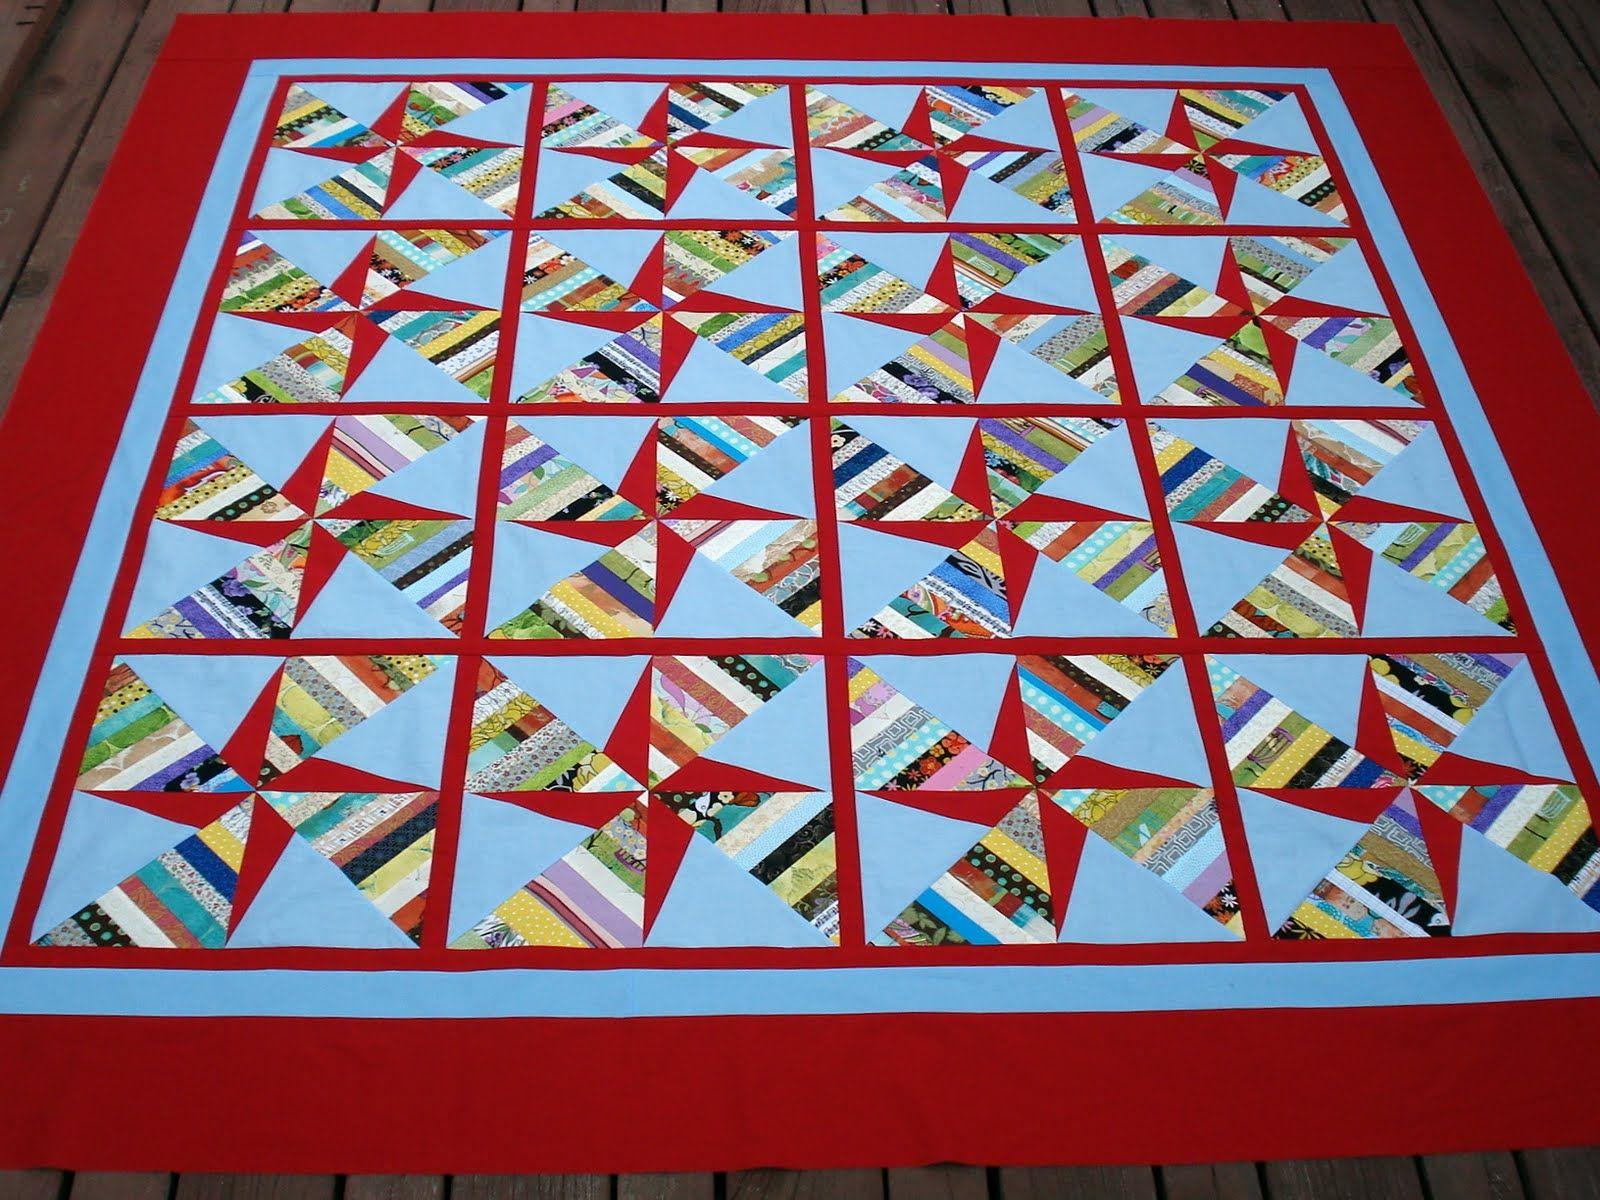 pinwheel quilts | Double Pinwheel String Quilt | Quilt ideas ... : double pinwheel quilt - Adamdwight.com